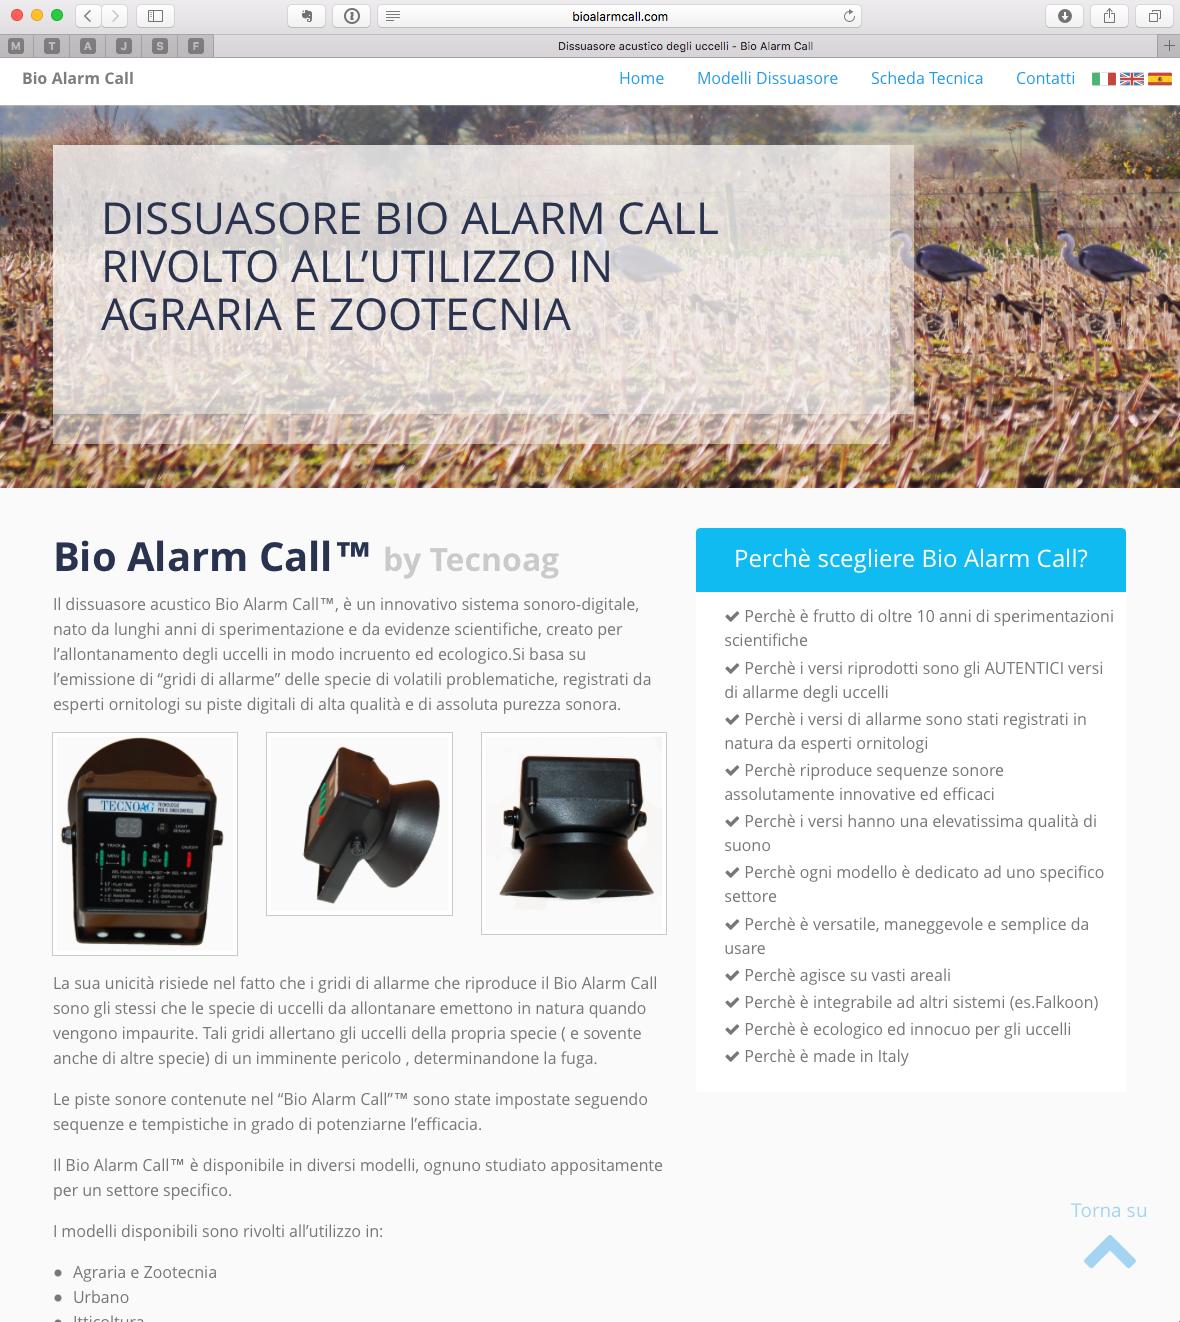 Bio Alarm Call